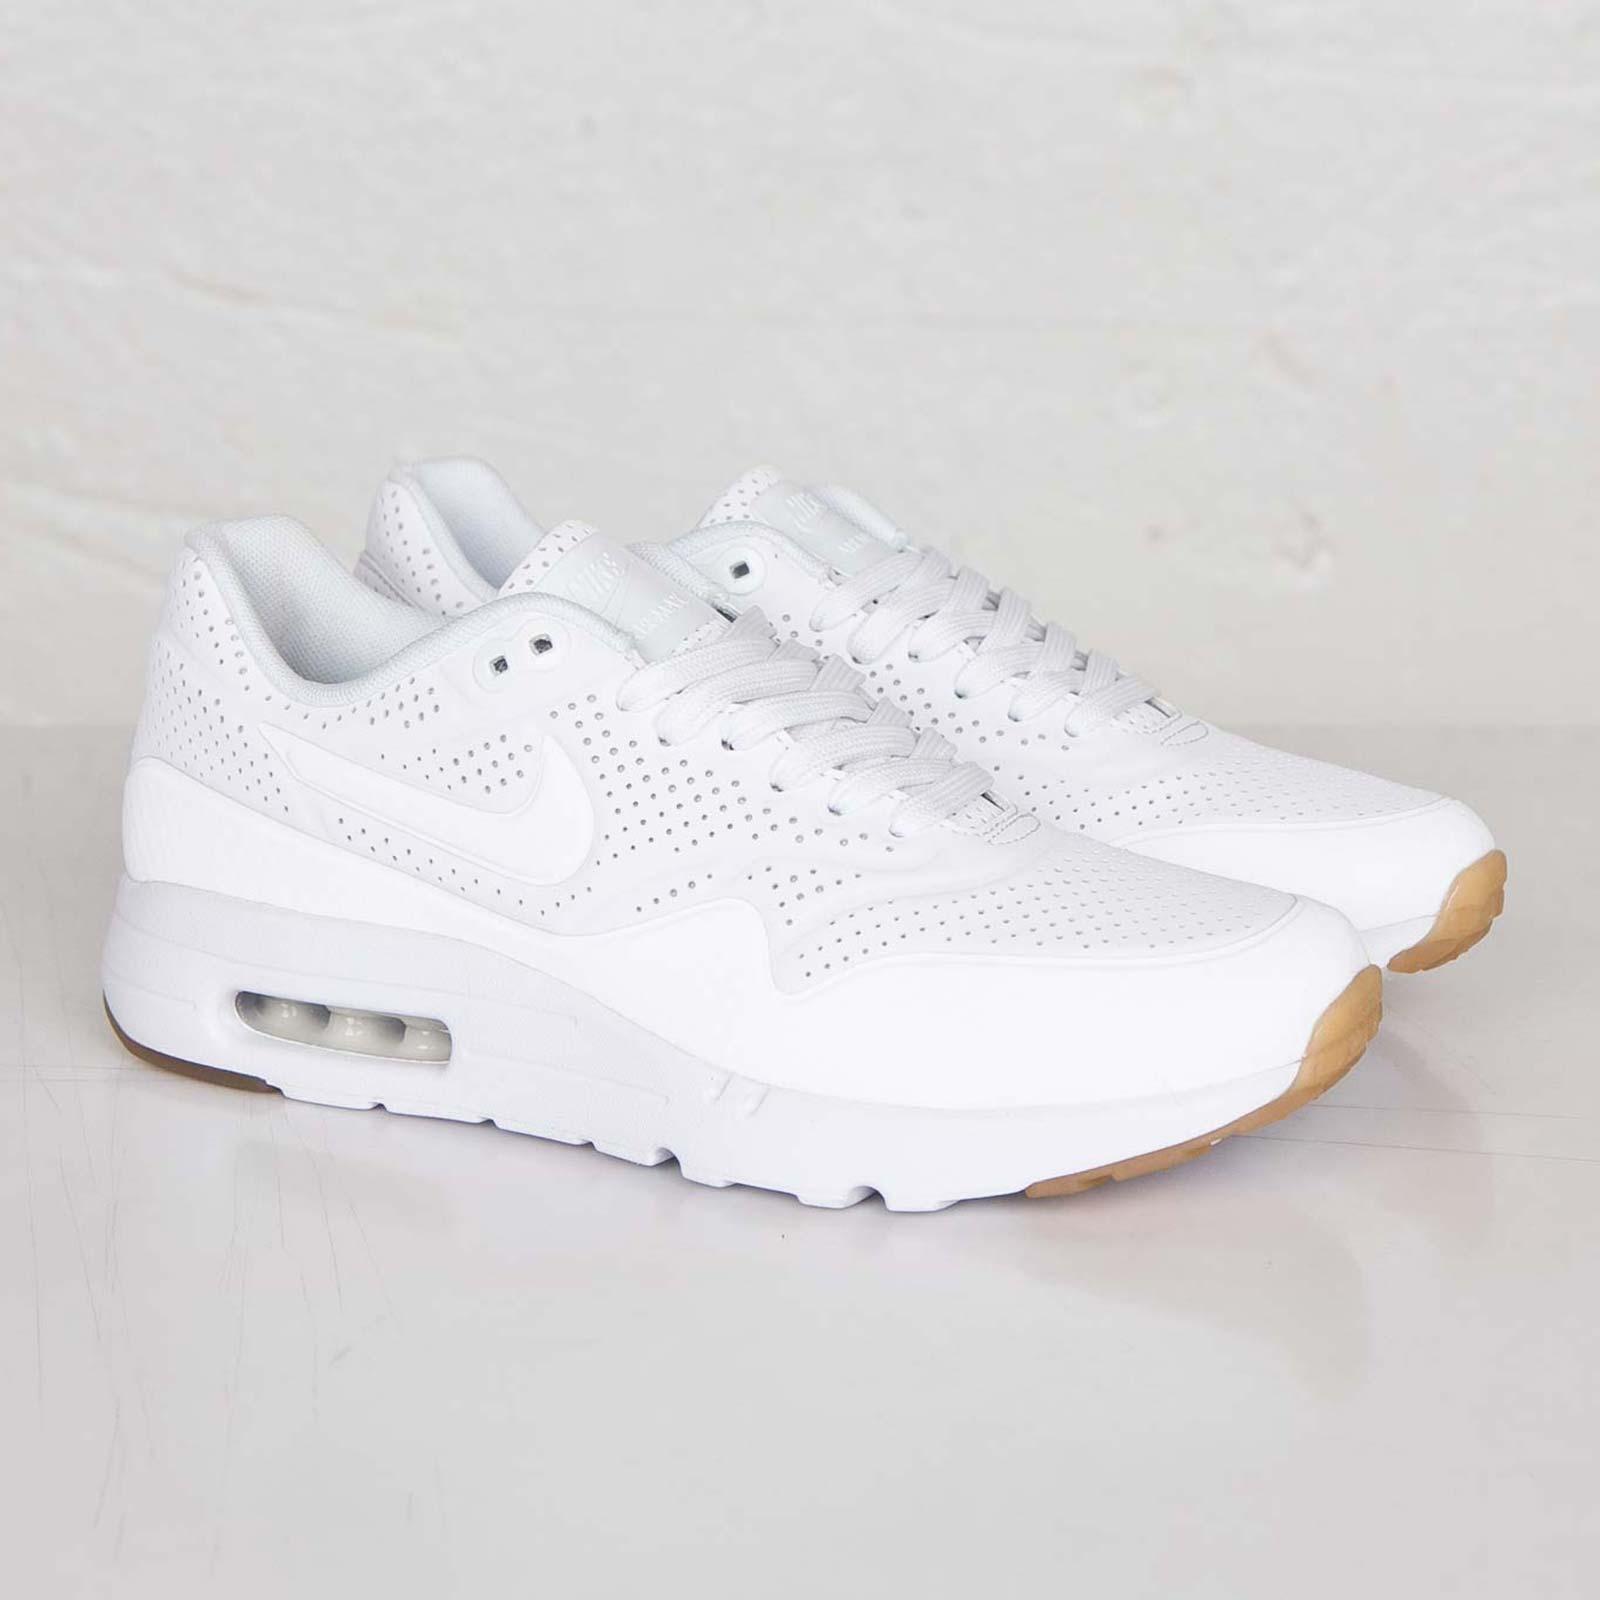 Nike Air Max 1 Ultra Moire 705297 111 Sneakersnstuff